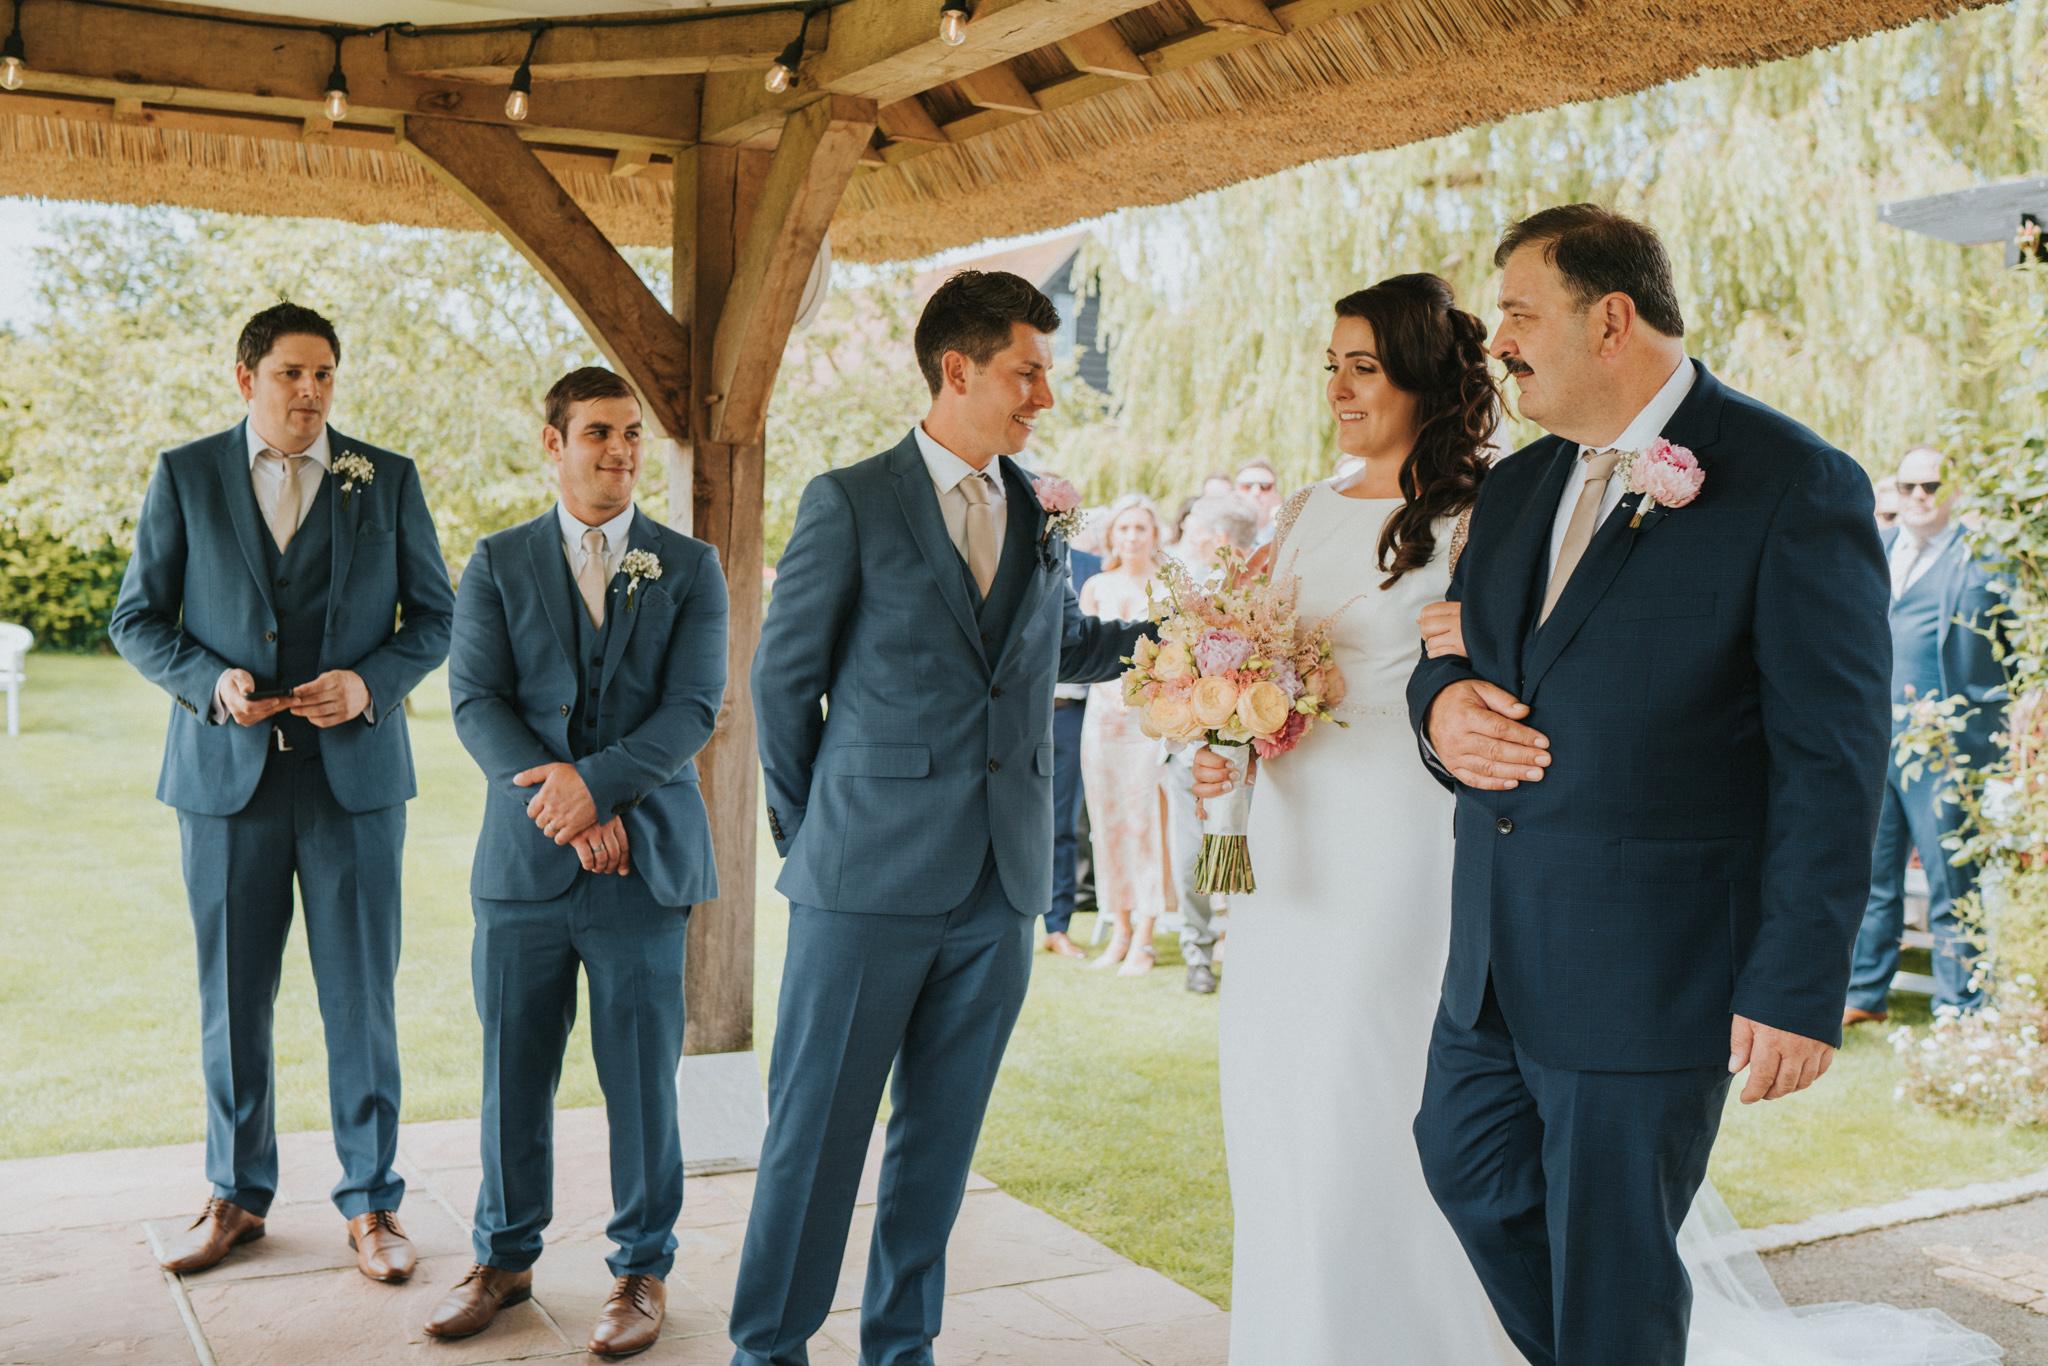 danielle-and-gareths-boho-wedding-previews-at-high-house-weddings-grace-elizabeth-colchester-essex-suffolk-norfolk-devon-alternative-wedding-and-lifestyle-photographer (25 of 76).jpg